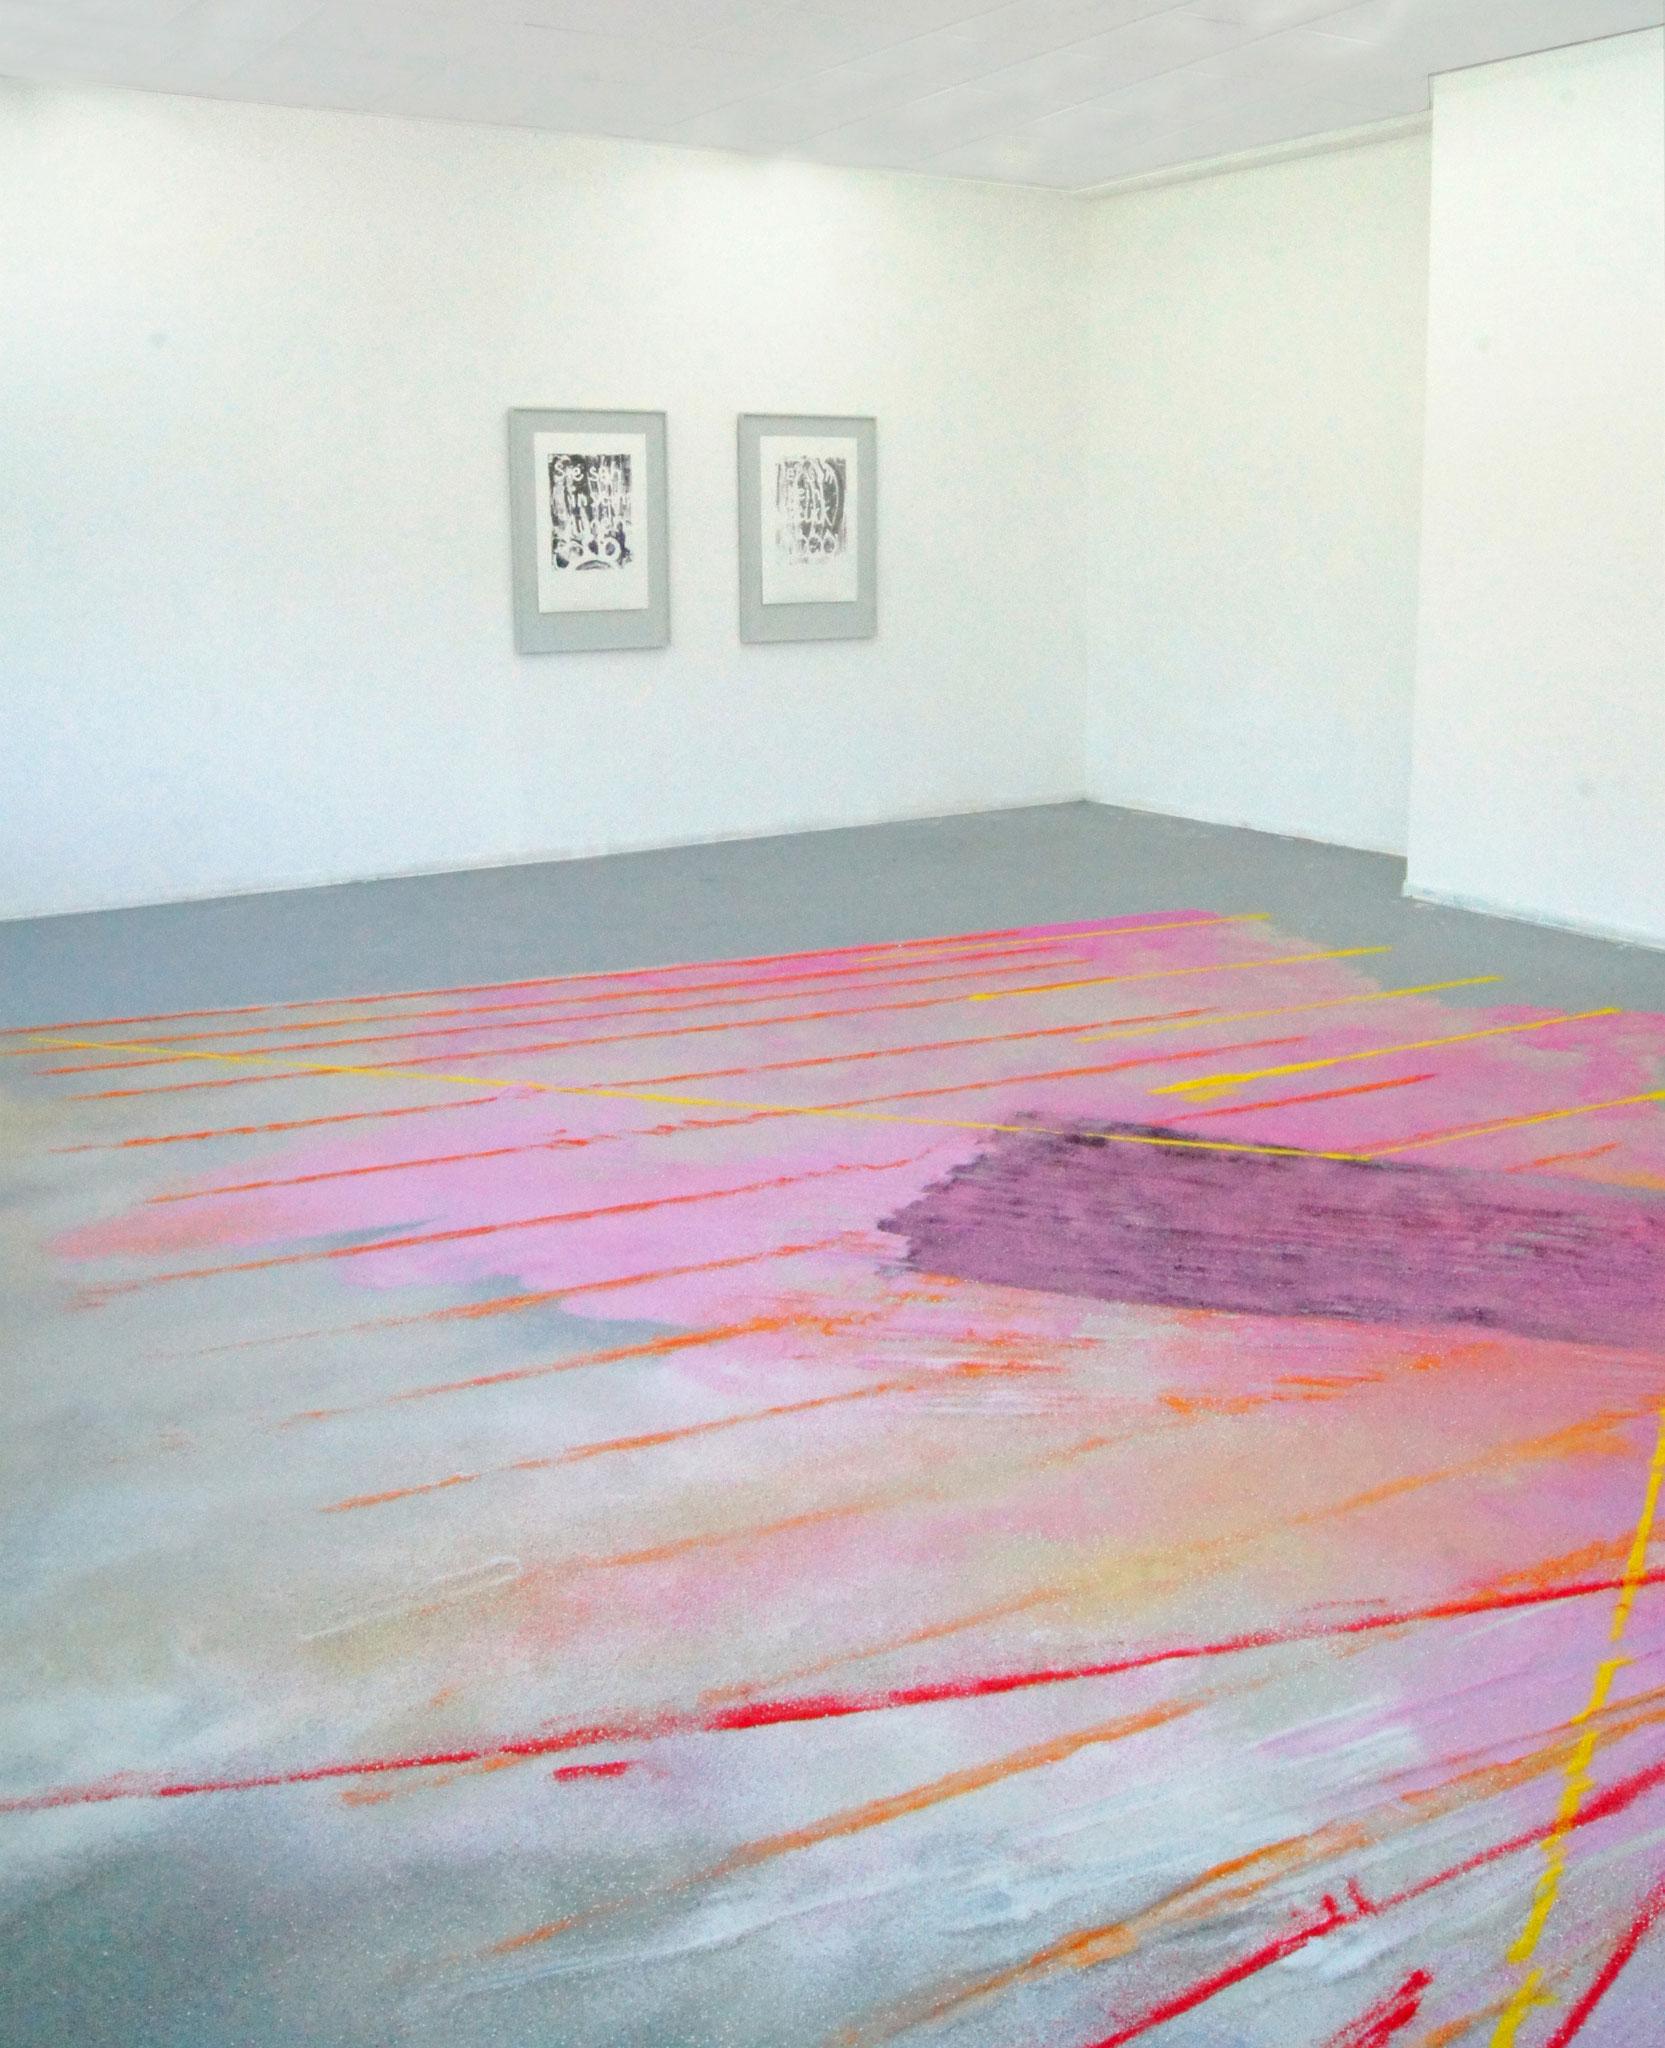 Arthur est un perroquet/ Arthur ist ein Papagei  Farbsand auf Boden, 5x6 m  Ausstellungsansicht : Cover your crystal eyes, Meisterschülerausstellung,2016